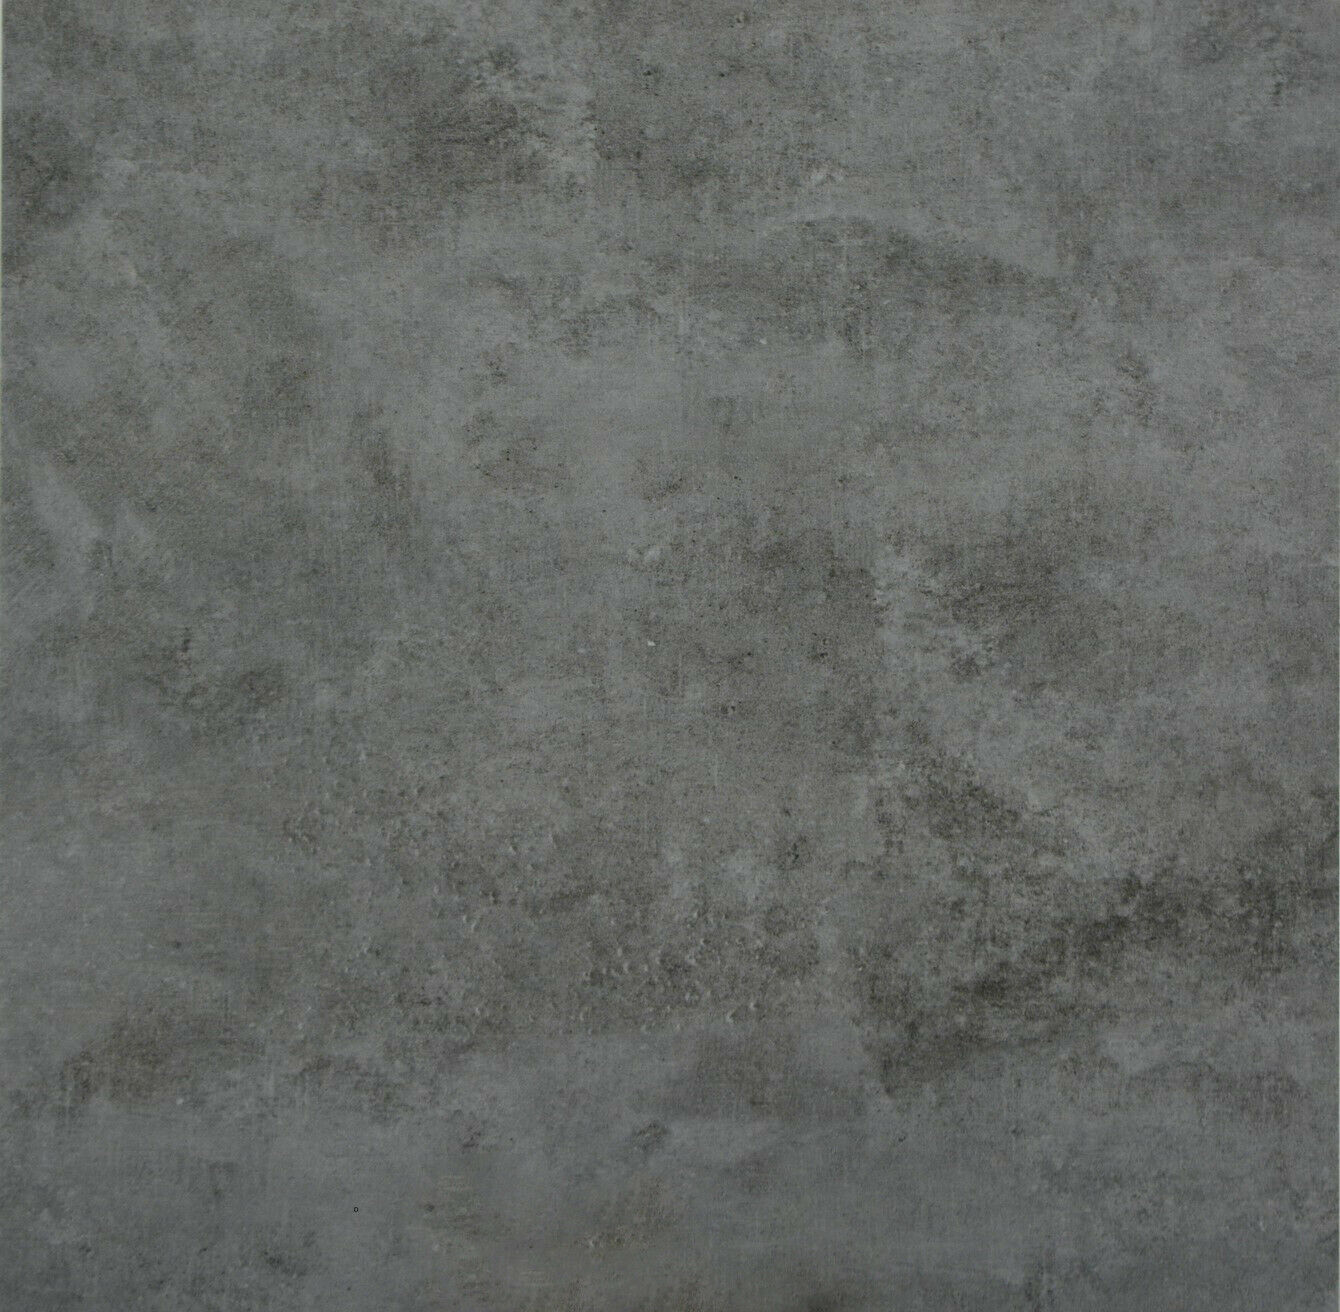 Matt Grey Ceramic Floor Tiles